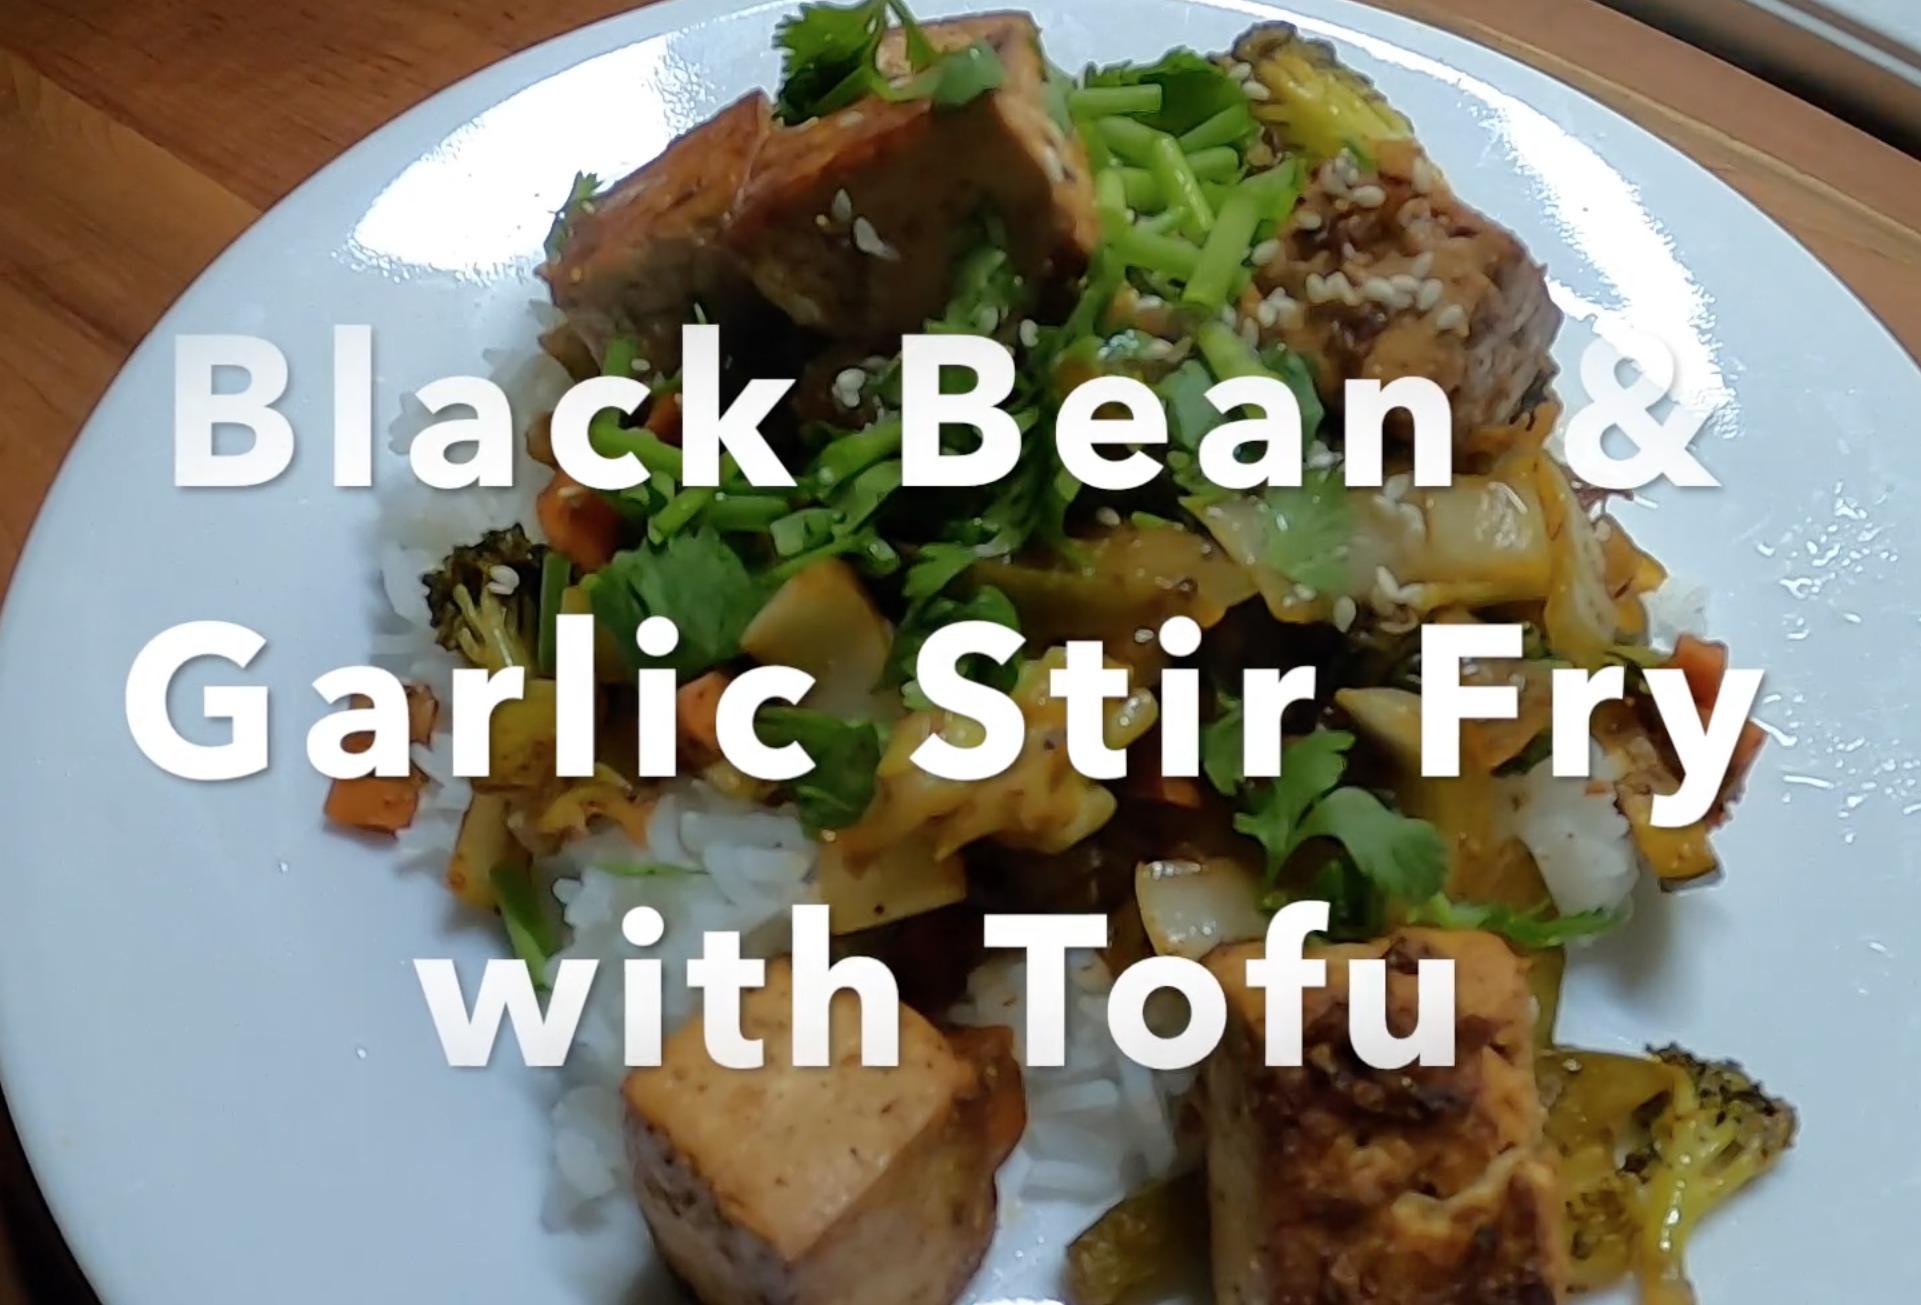 Black Bean & Garlic Stir Fry with Tofu